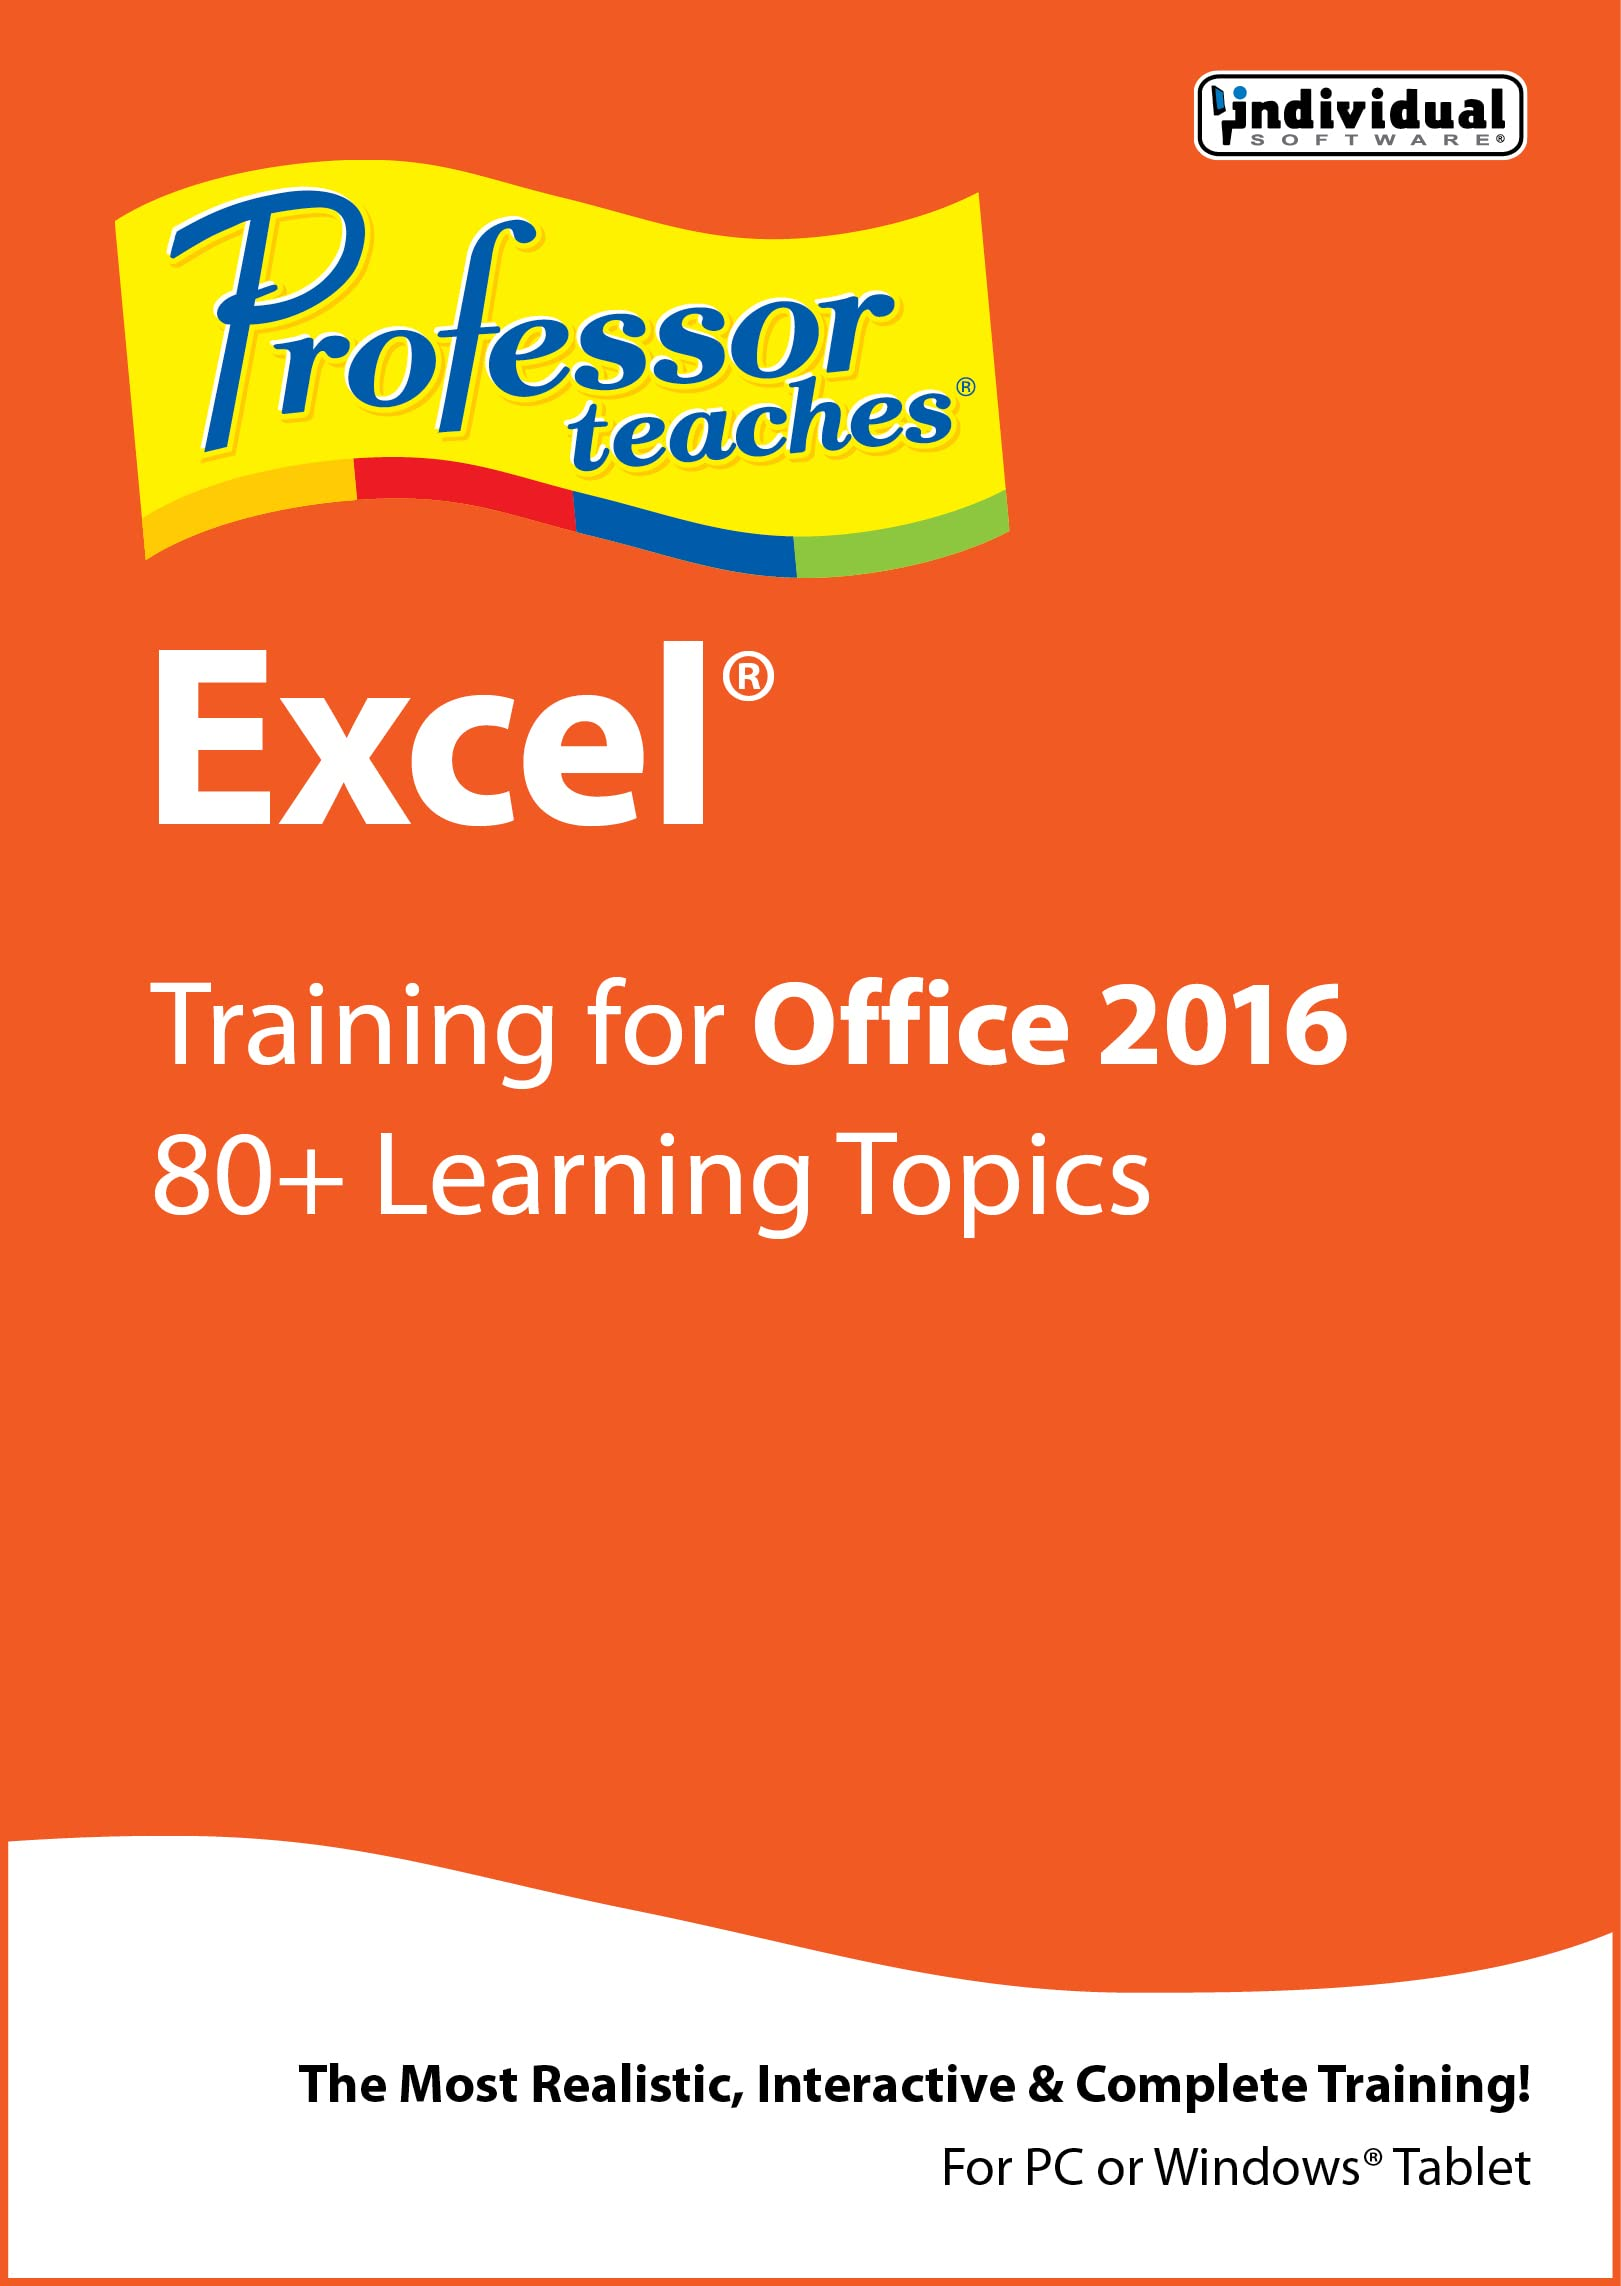 Professor Department store Teaches Excel Popular standard 2016 Download